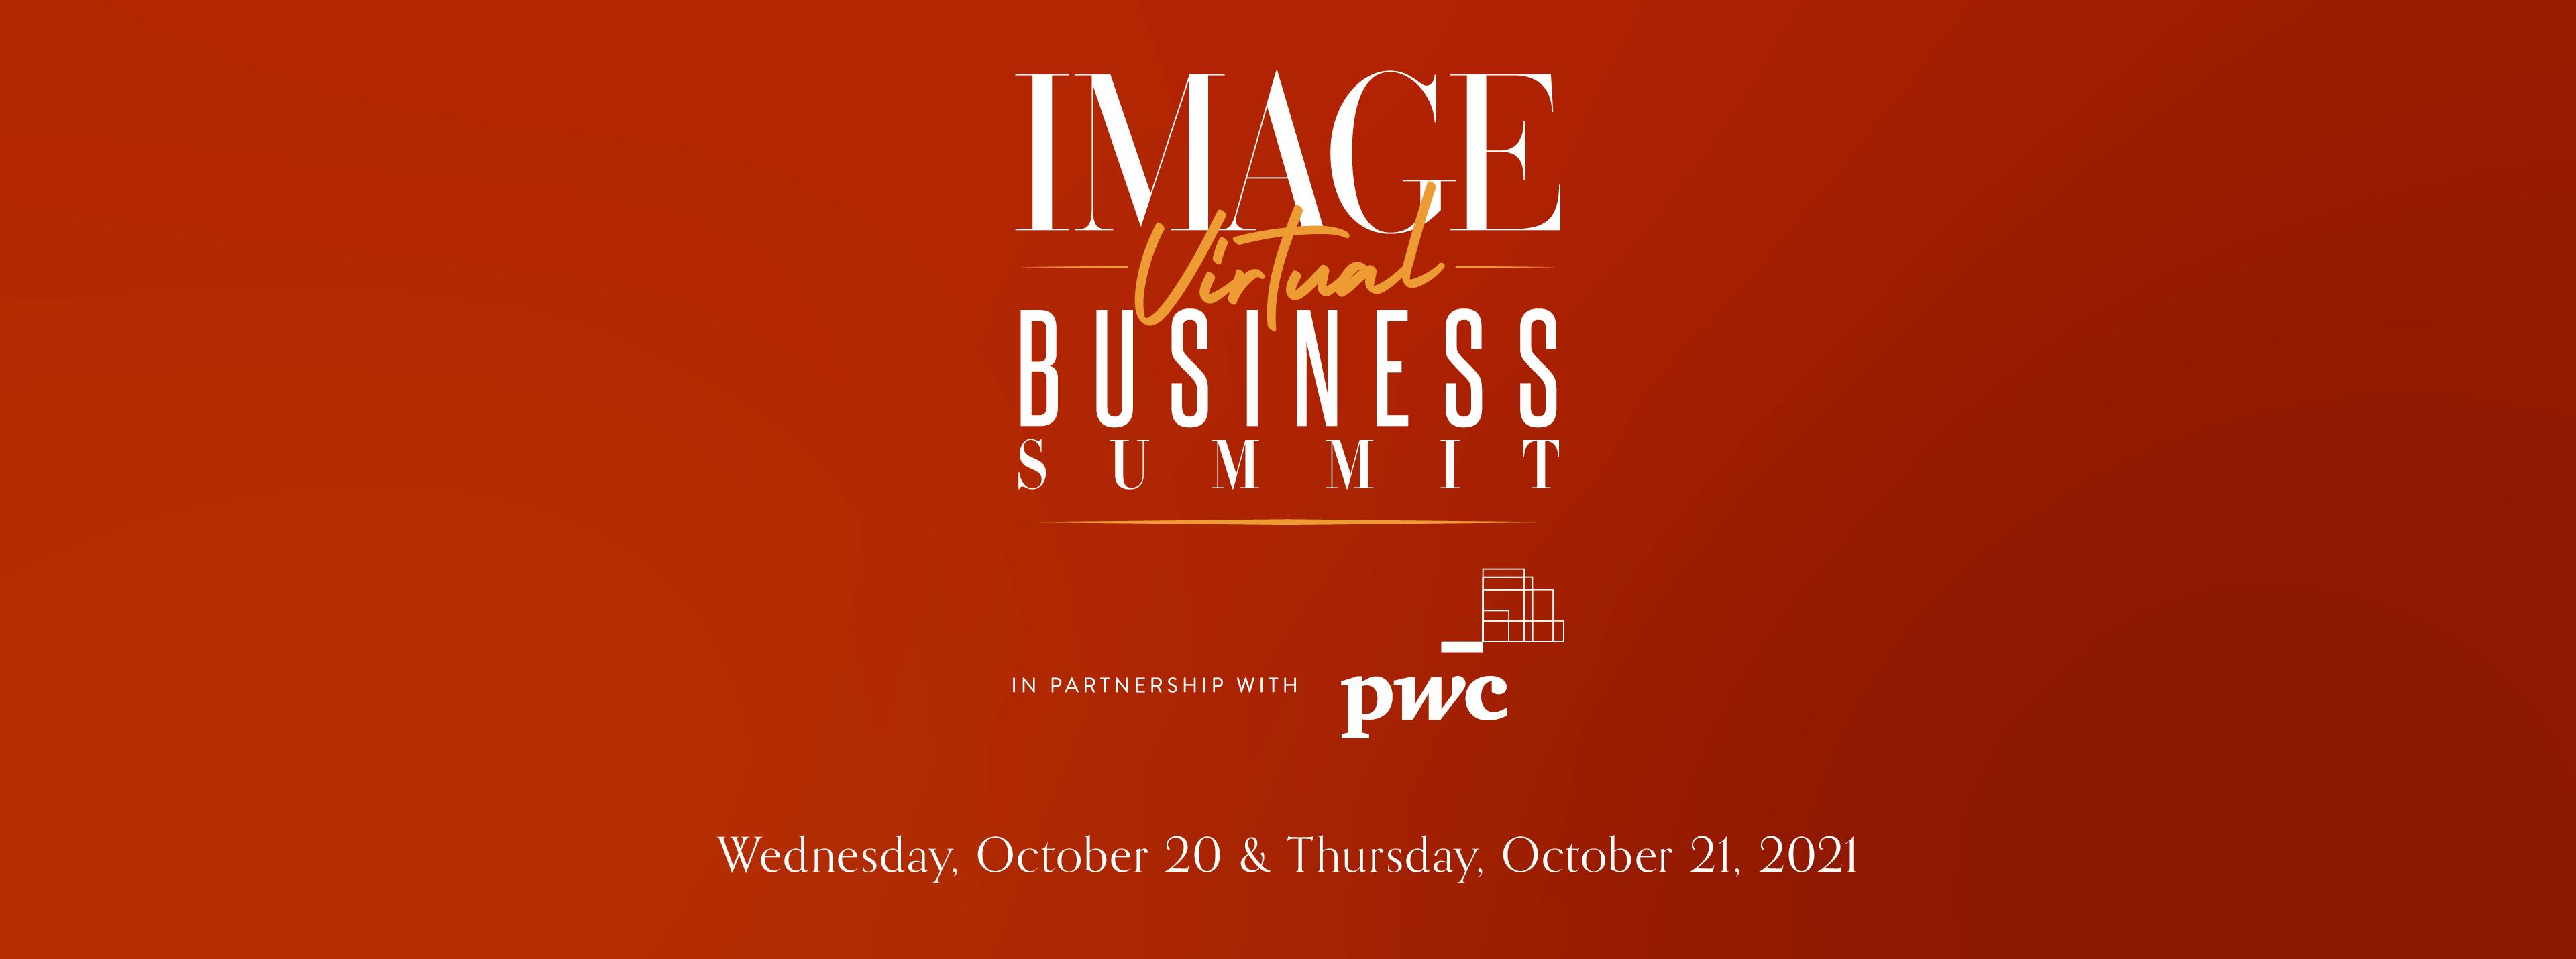 IMAGE Virtual Business Summit 2021